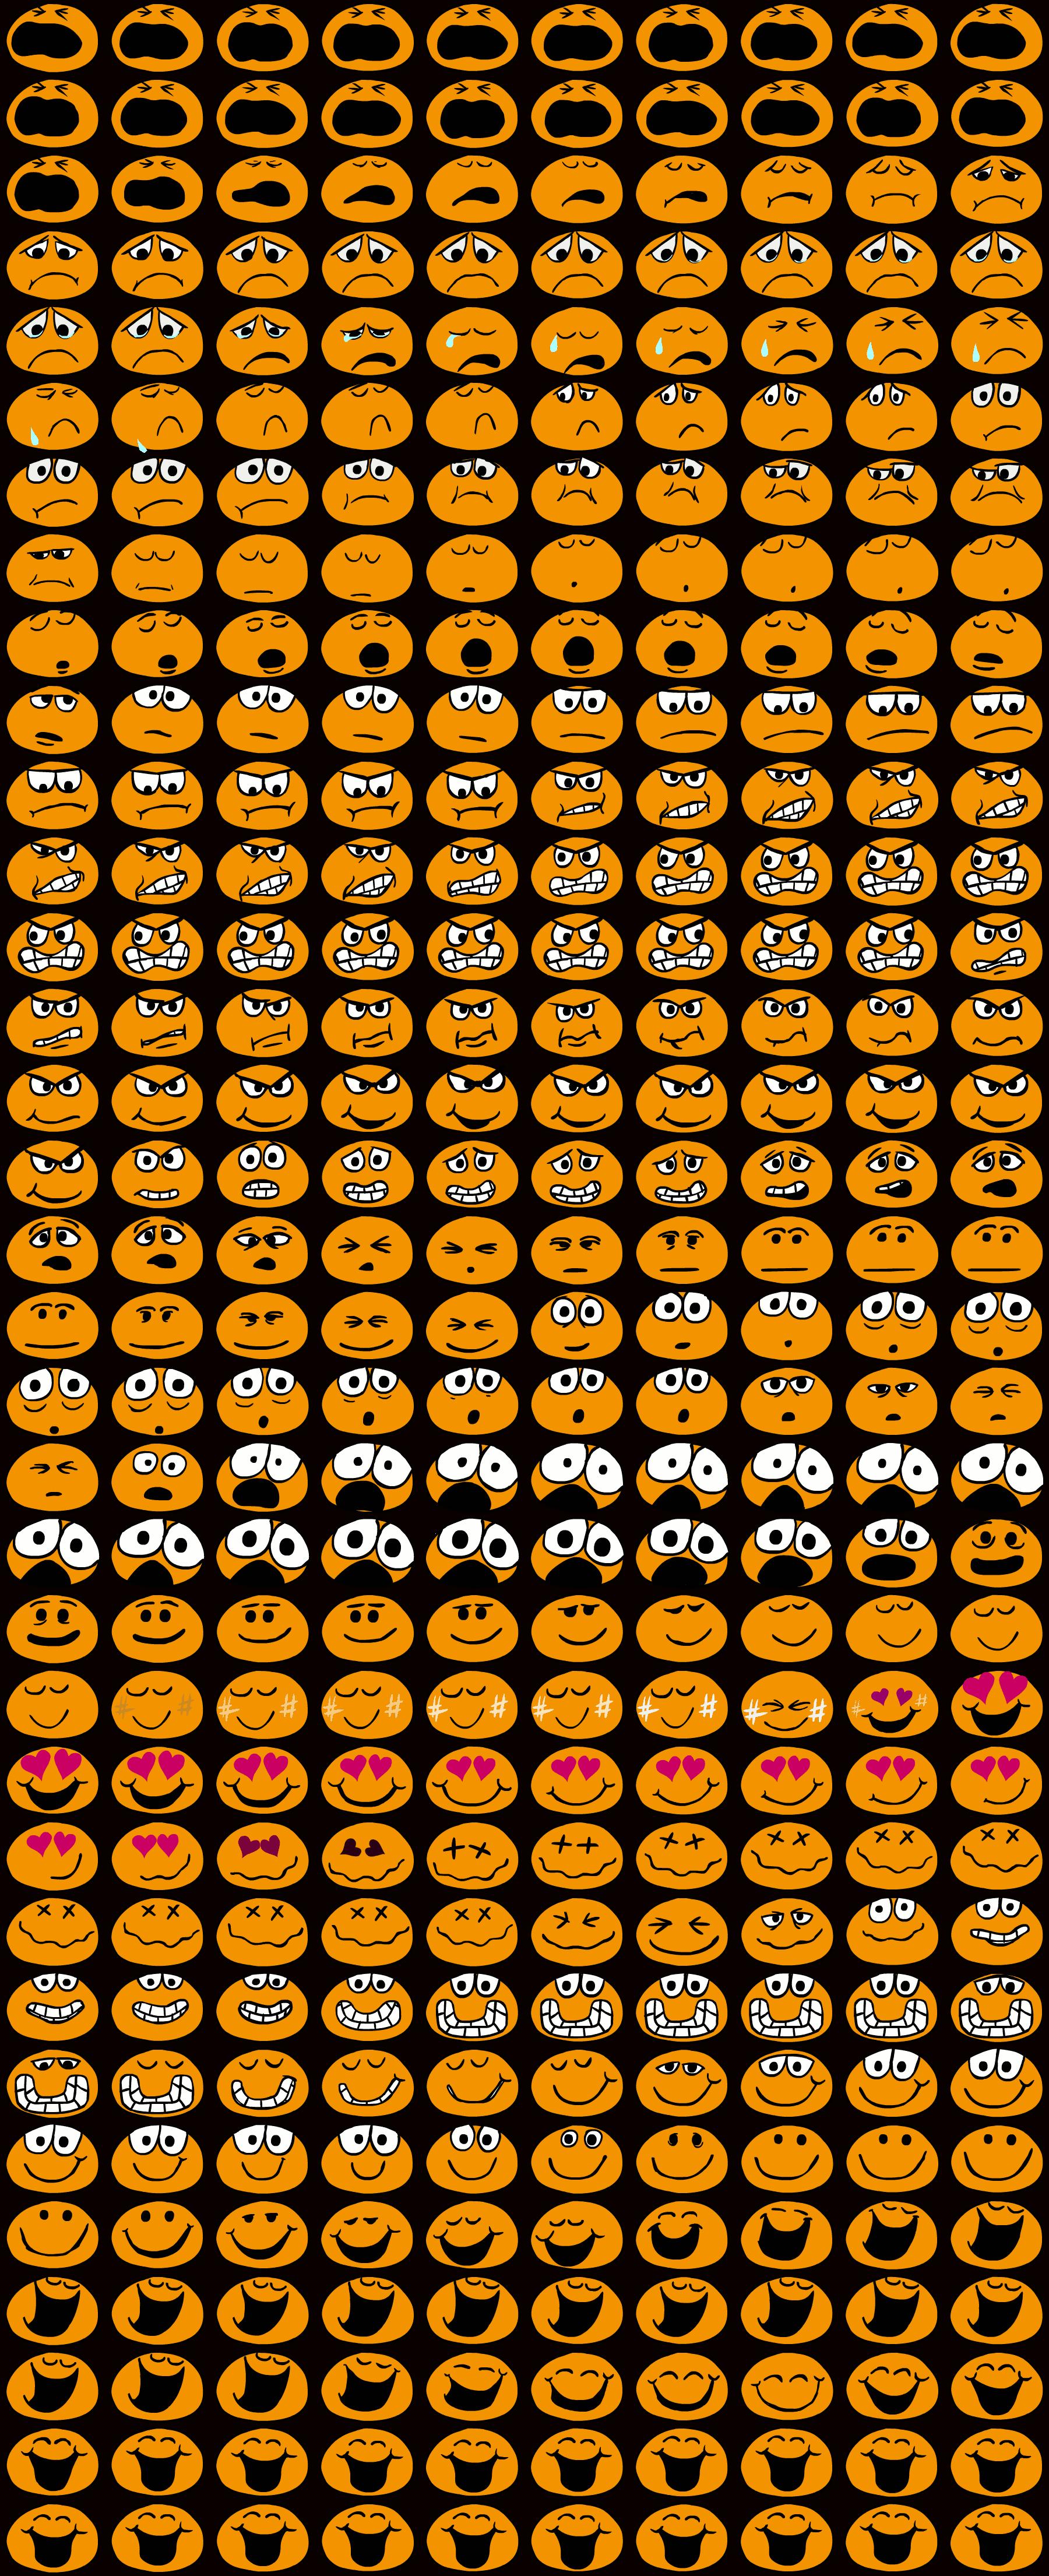 http://smyfaceimages.s3.amazonaws.com/moods_orange.png